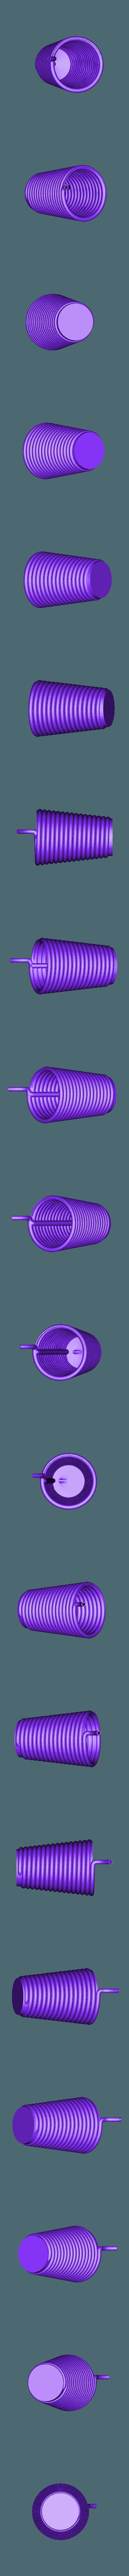 straw-glass-practical-v5-solid.stl Download free STL file Big StrawGlass - Practical • 3D print design, bLiTzJoN